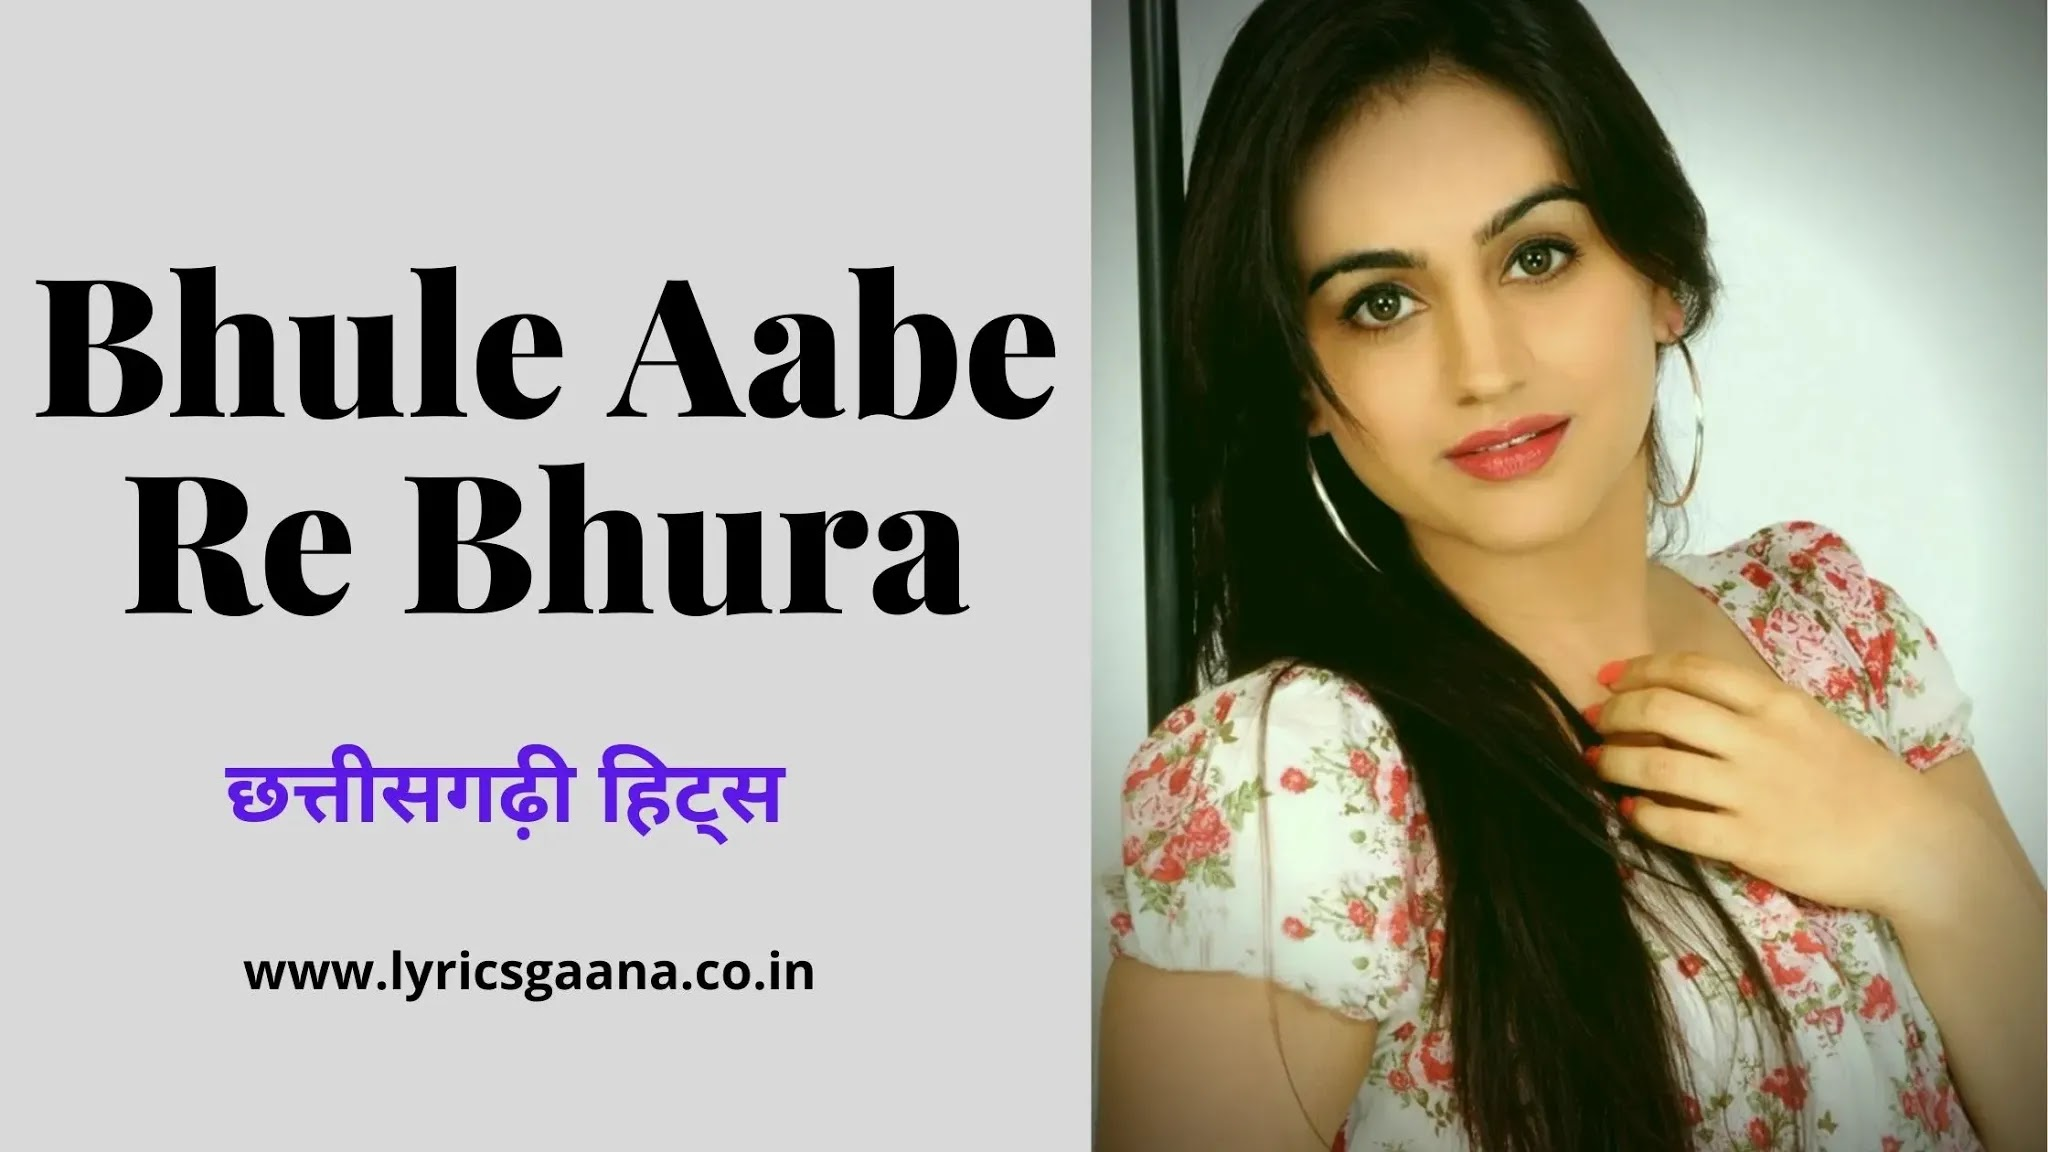 Bhule Aabe Re Bhaura Cg Song Lyrics | भूले आबे रे भवंरा